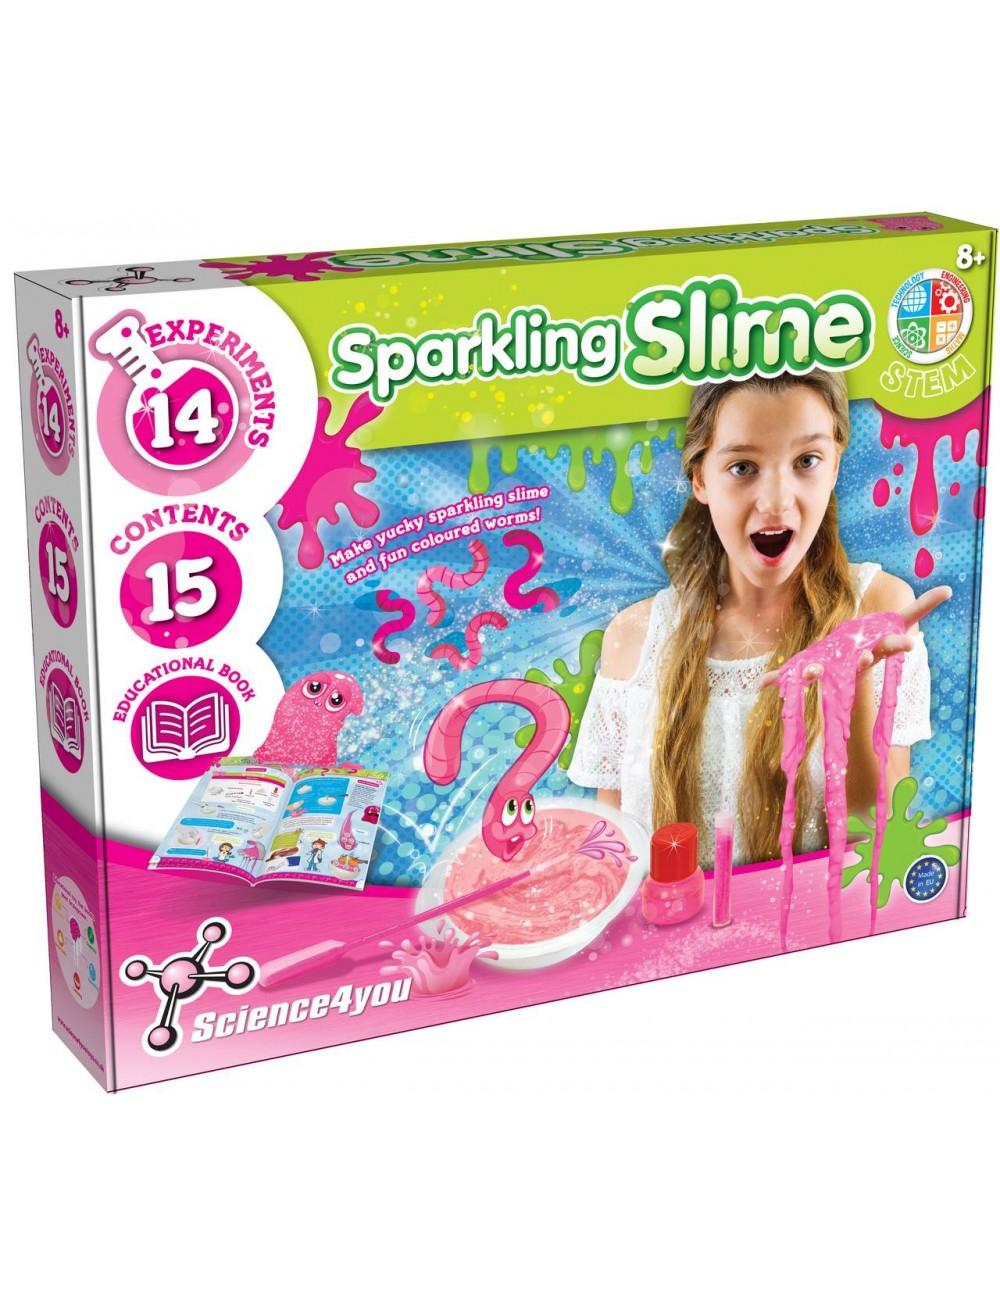 Slime Kit - Sparkling Slime